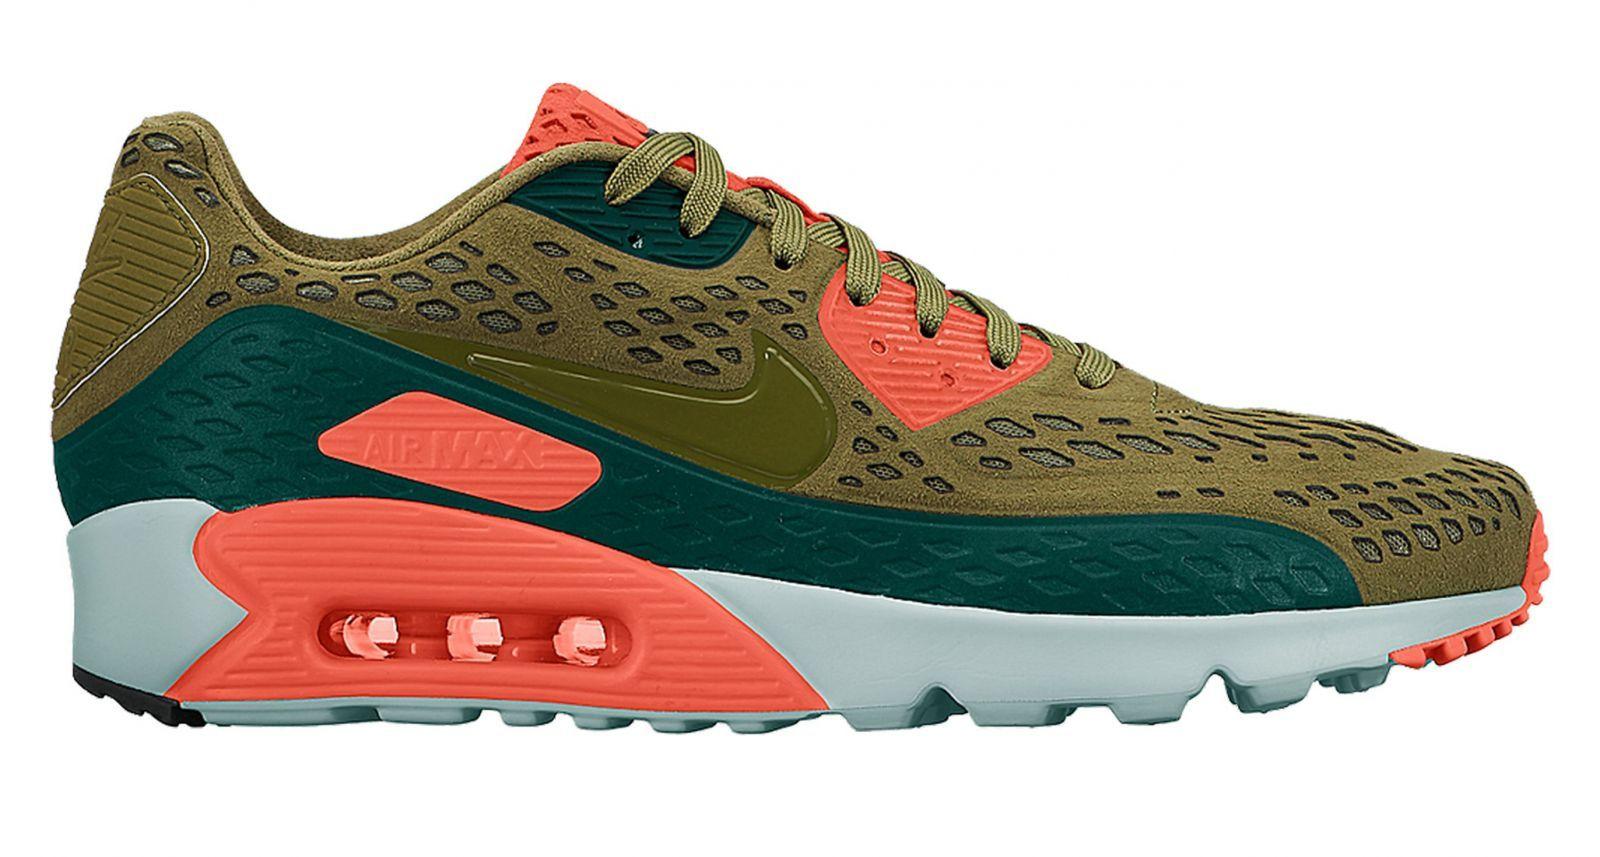 1f71c1c1b2b9 Nike Air Max 90 Ultra BR